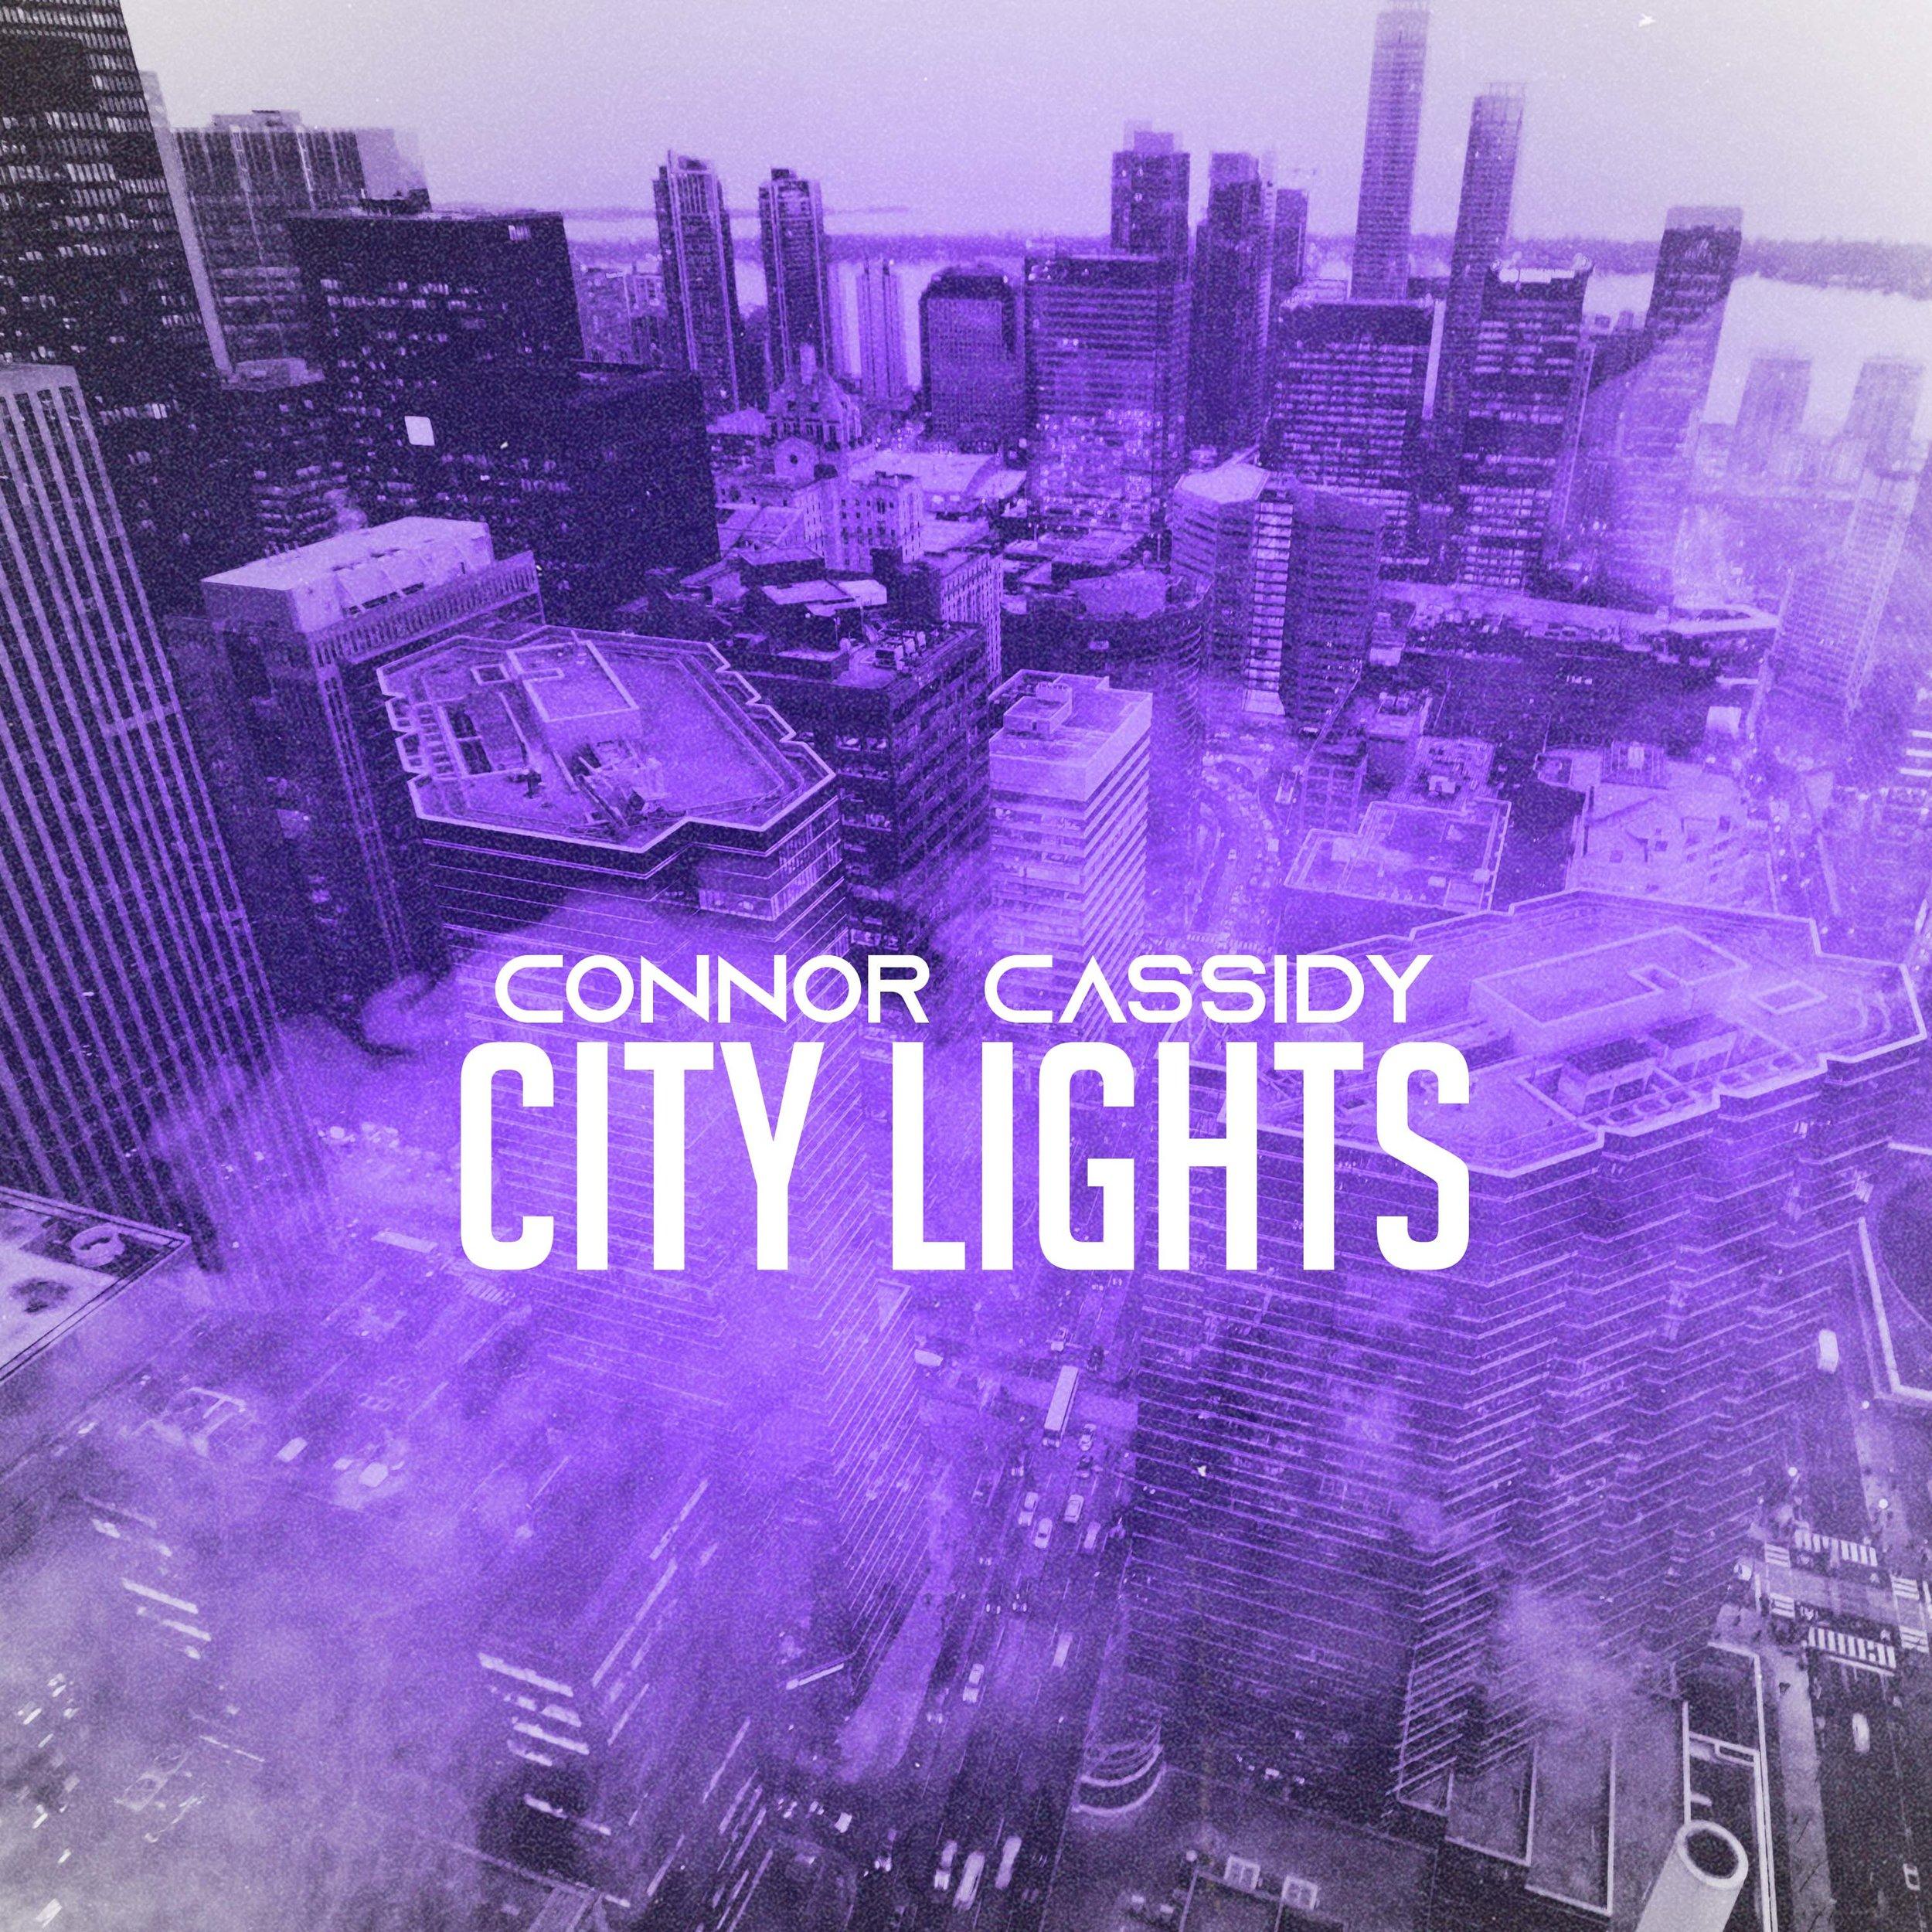 City Lights Art.jpg